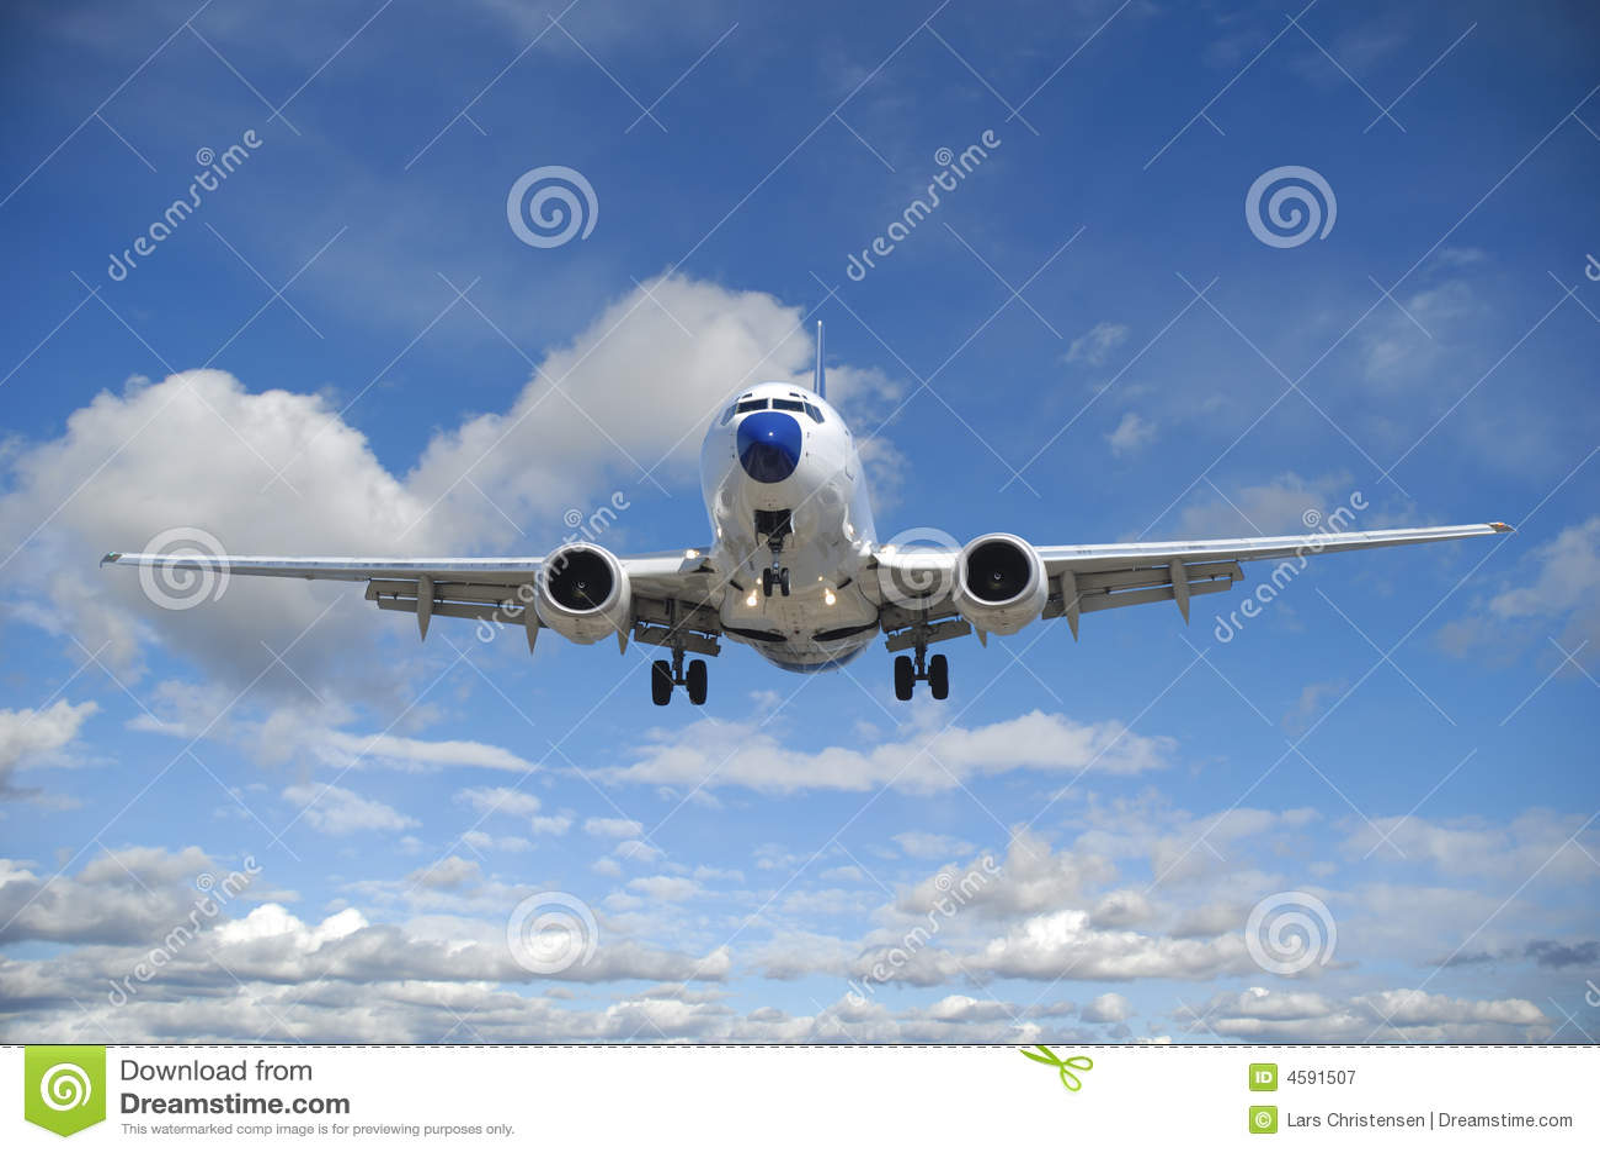 Air Transat Tours Ireland